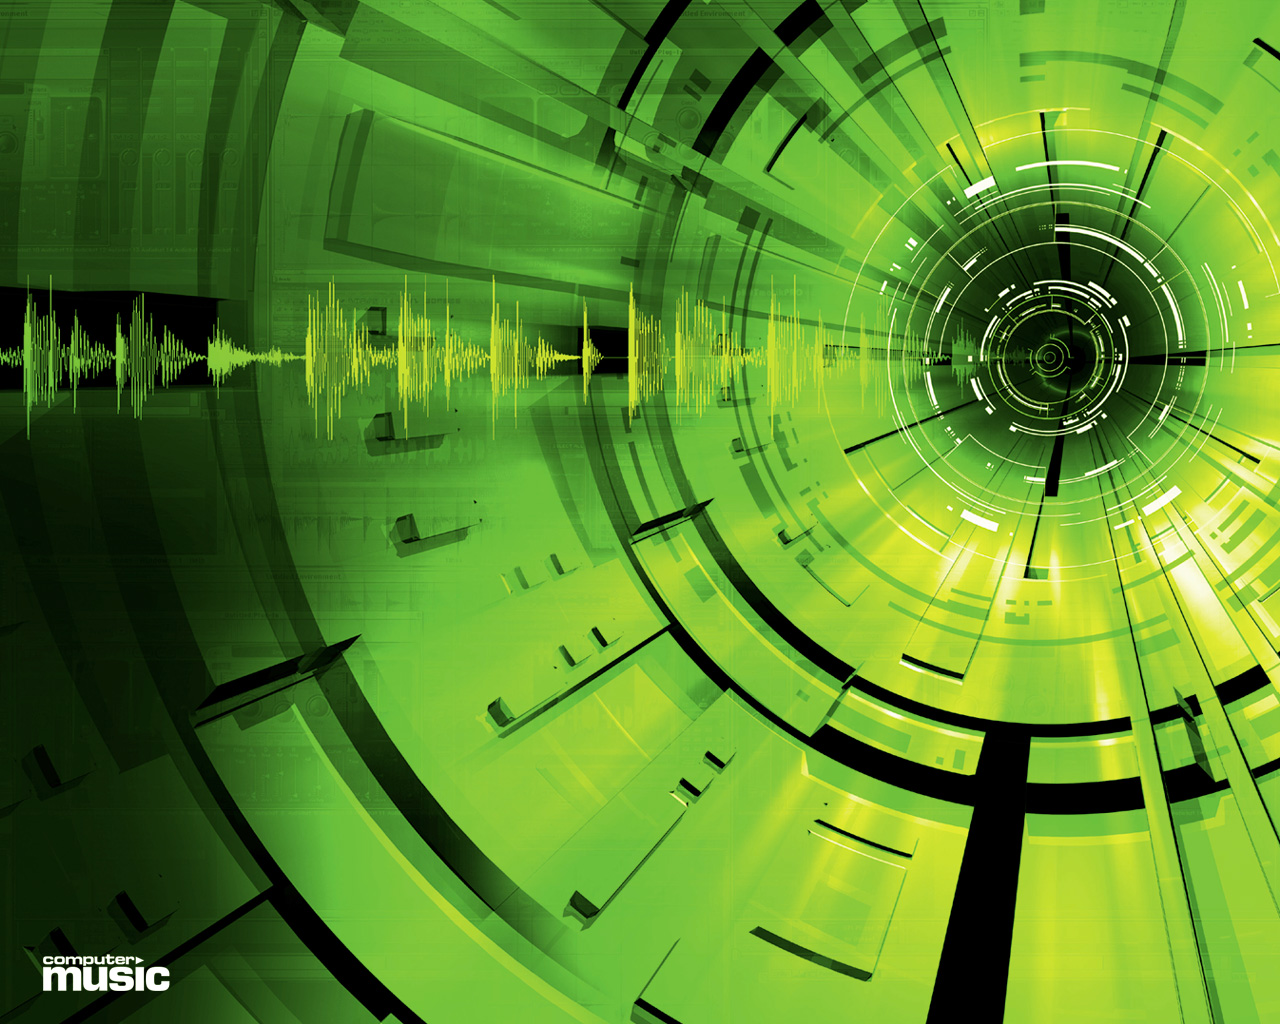 Techmusic-pump: Electronic Music Wallpapers